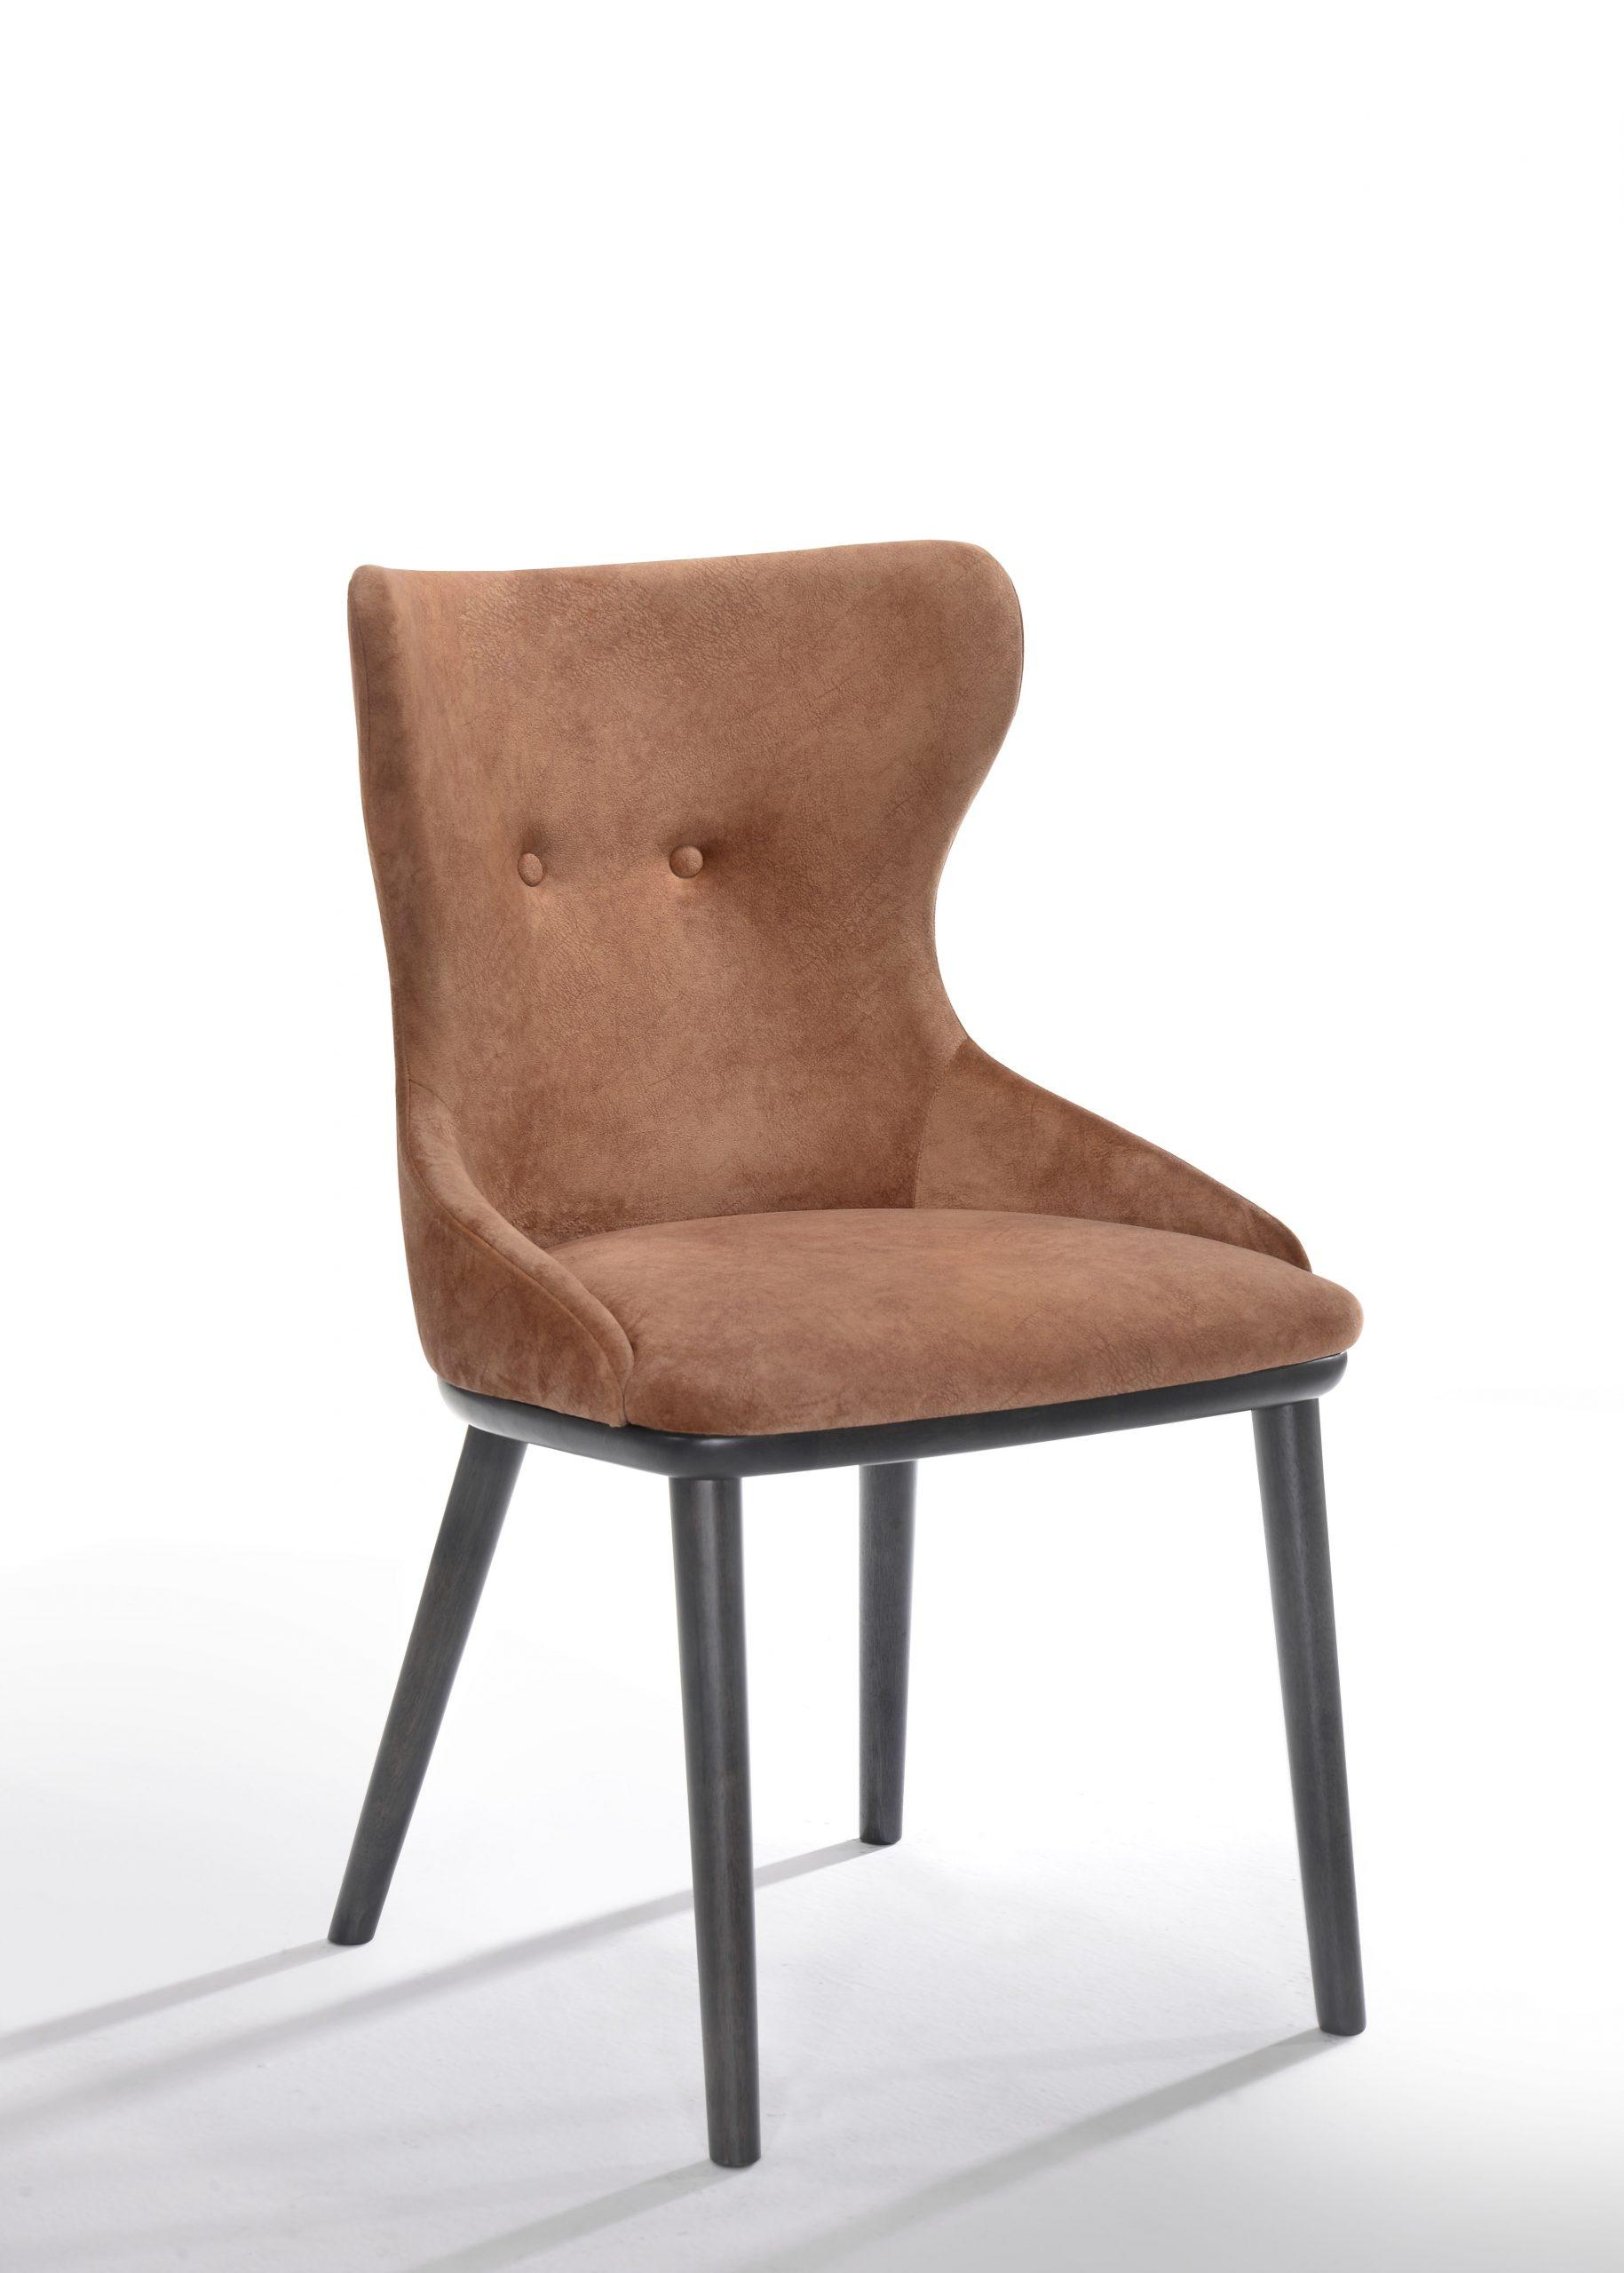 Mobiliya design - Stul -  Mİ-776  - 1